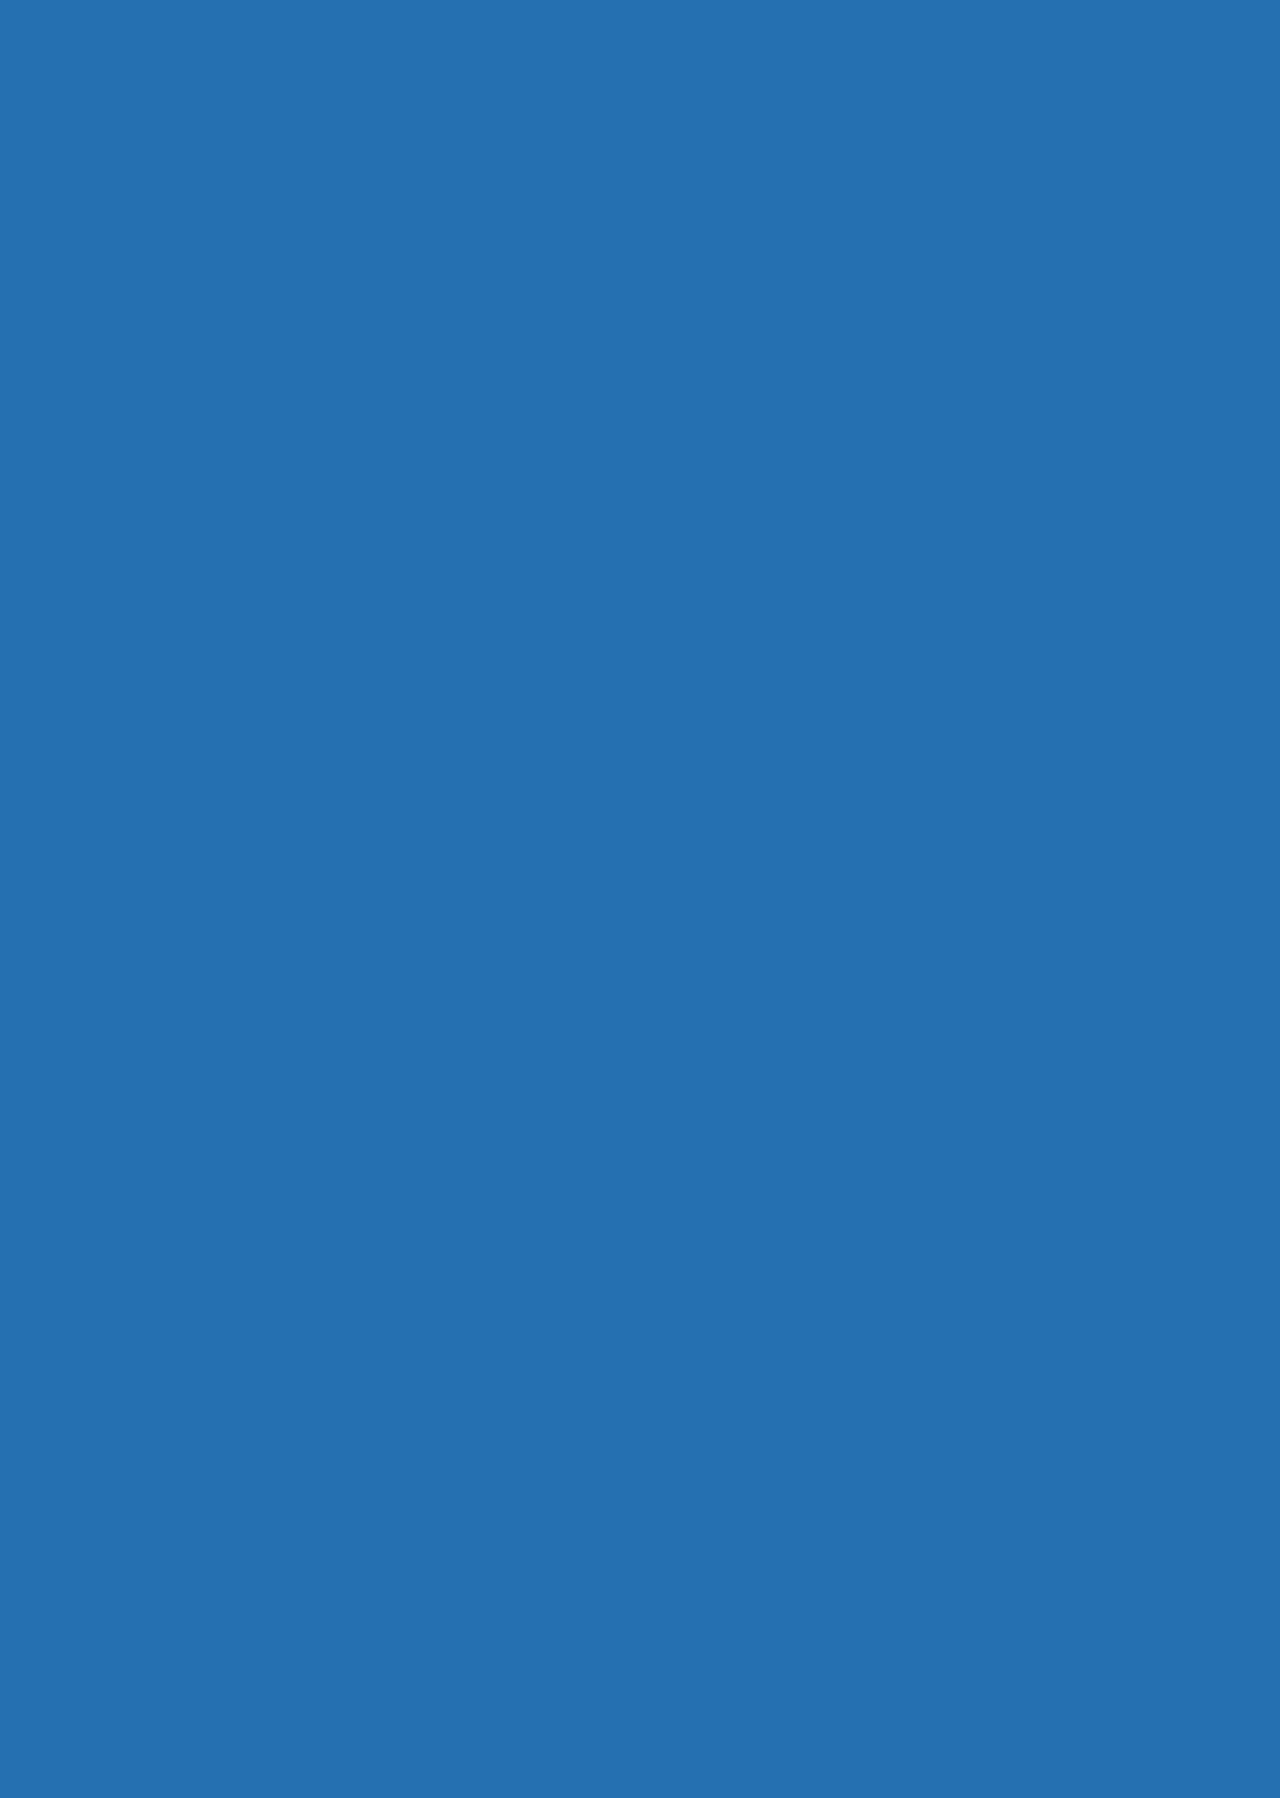 Sweet Blue | 甜蜜之蓝 1